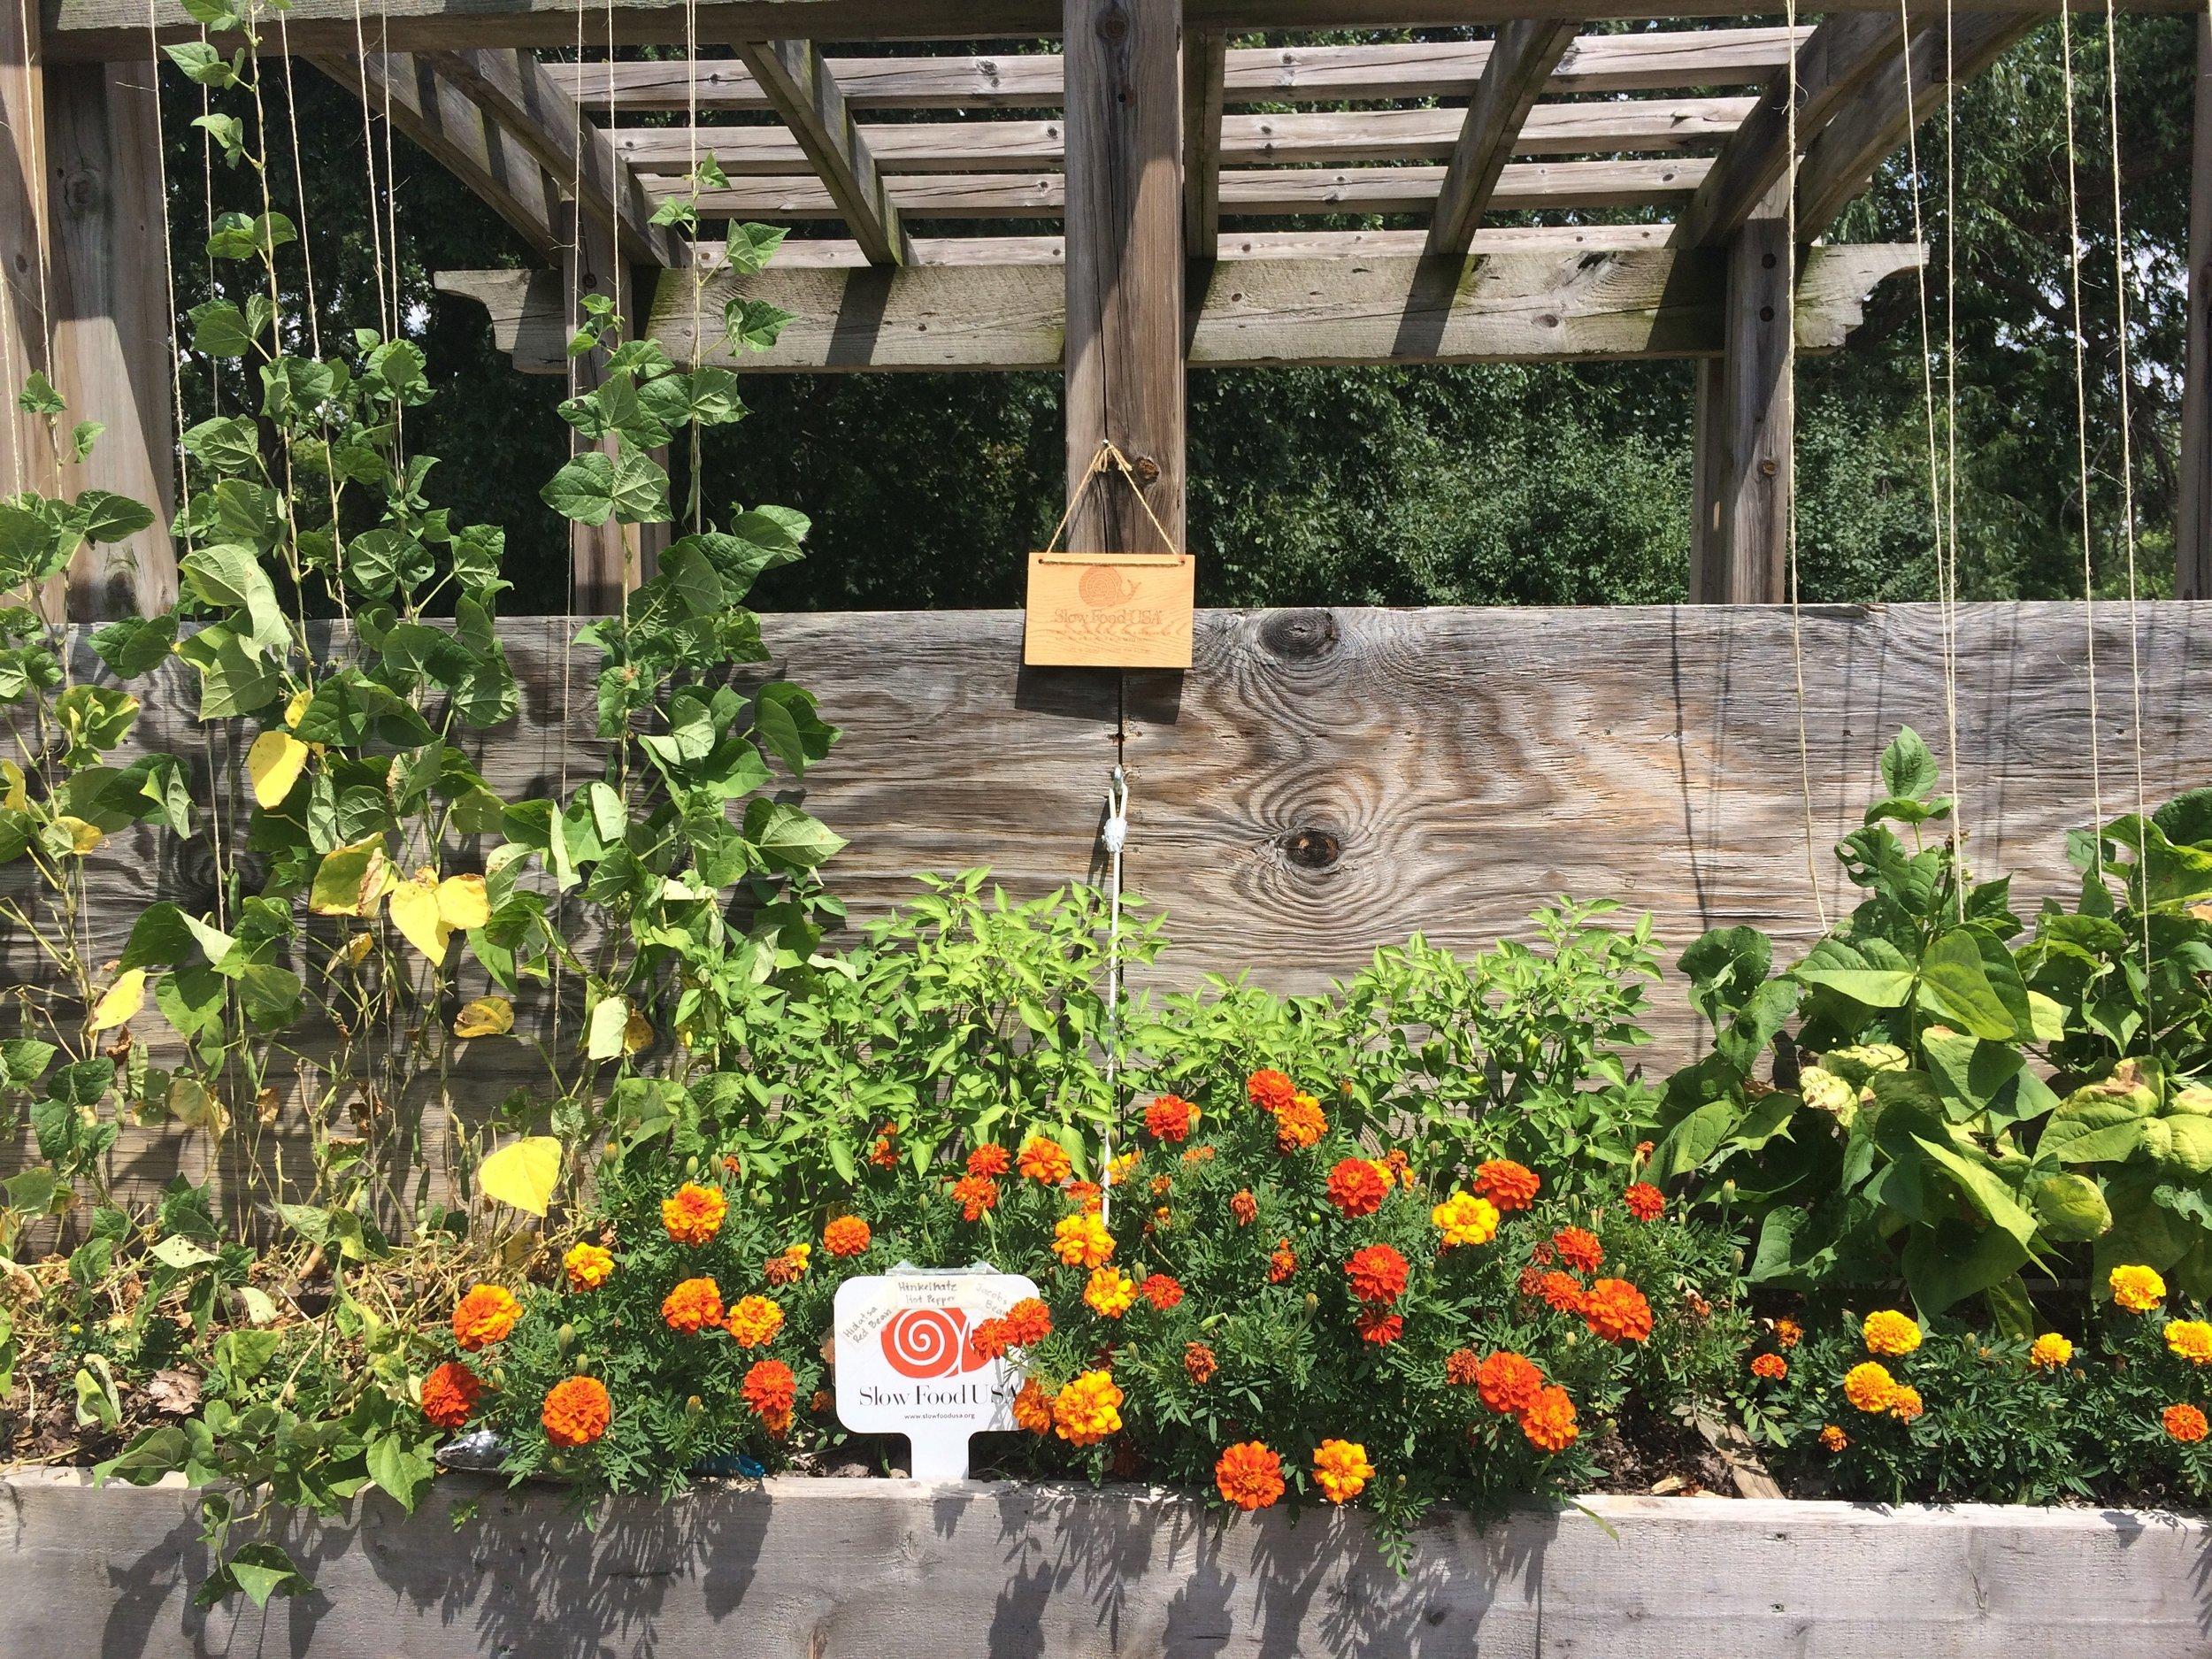 Ark of Taste garden at County Farm Park